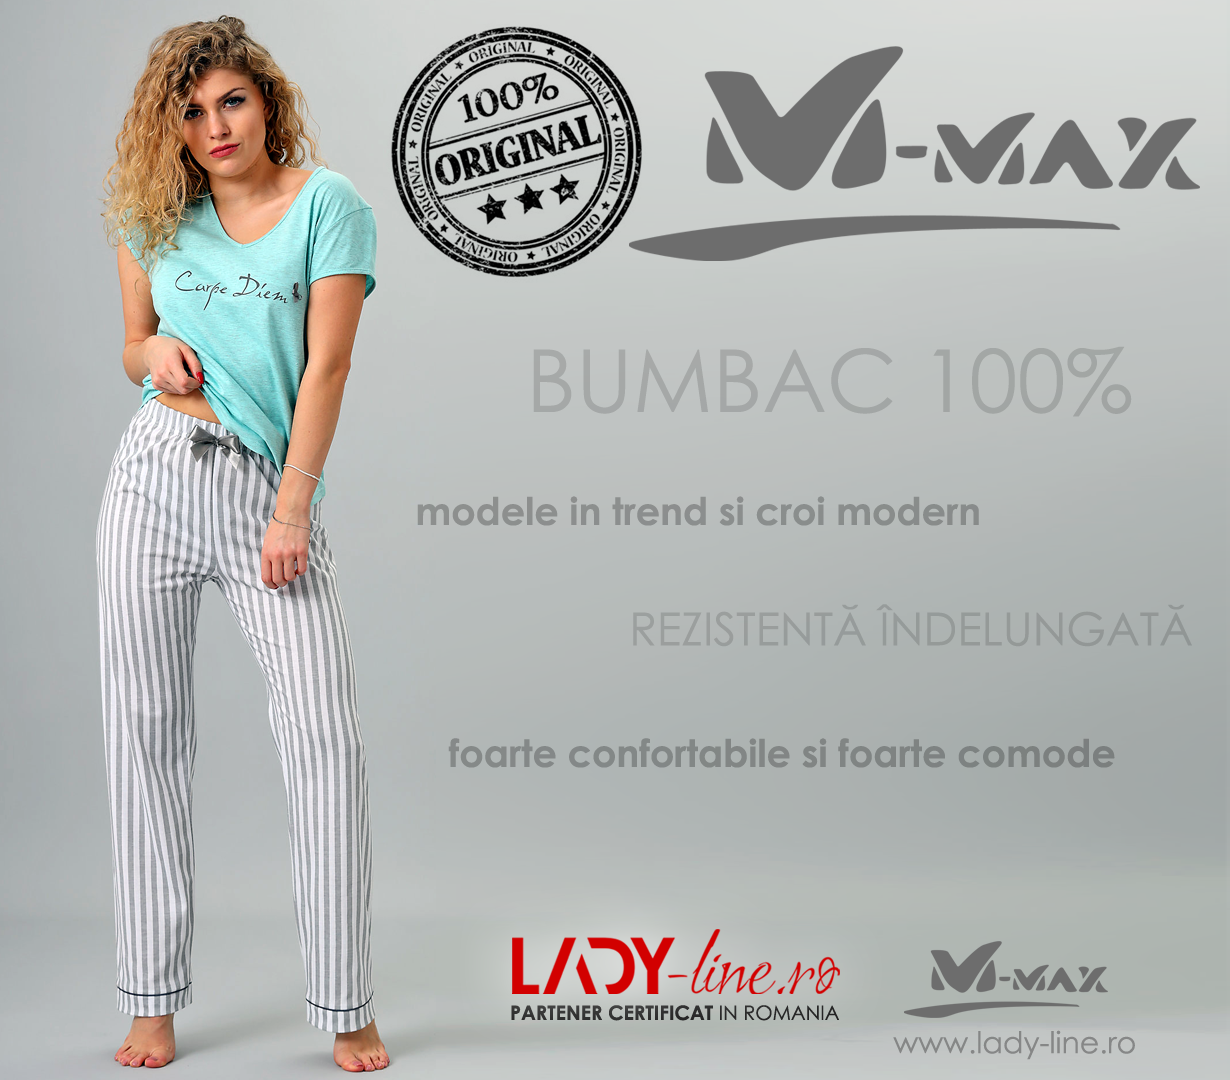 Pijama Dama M-Max, Bumbac 100%, 'Carpe Diem'